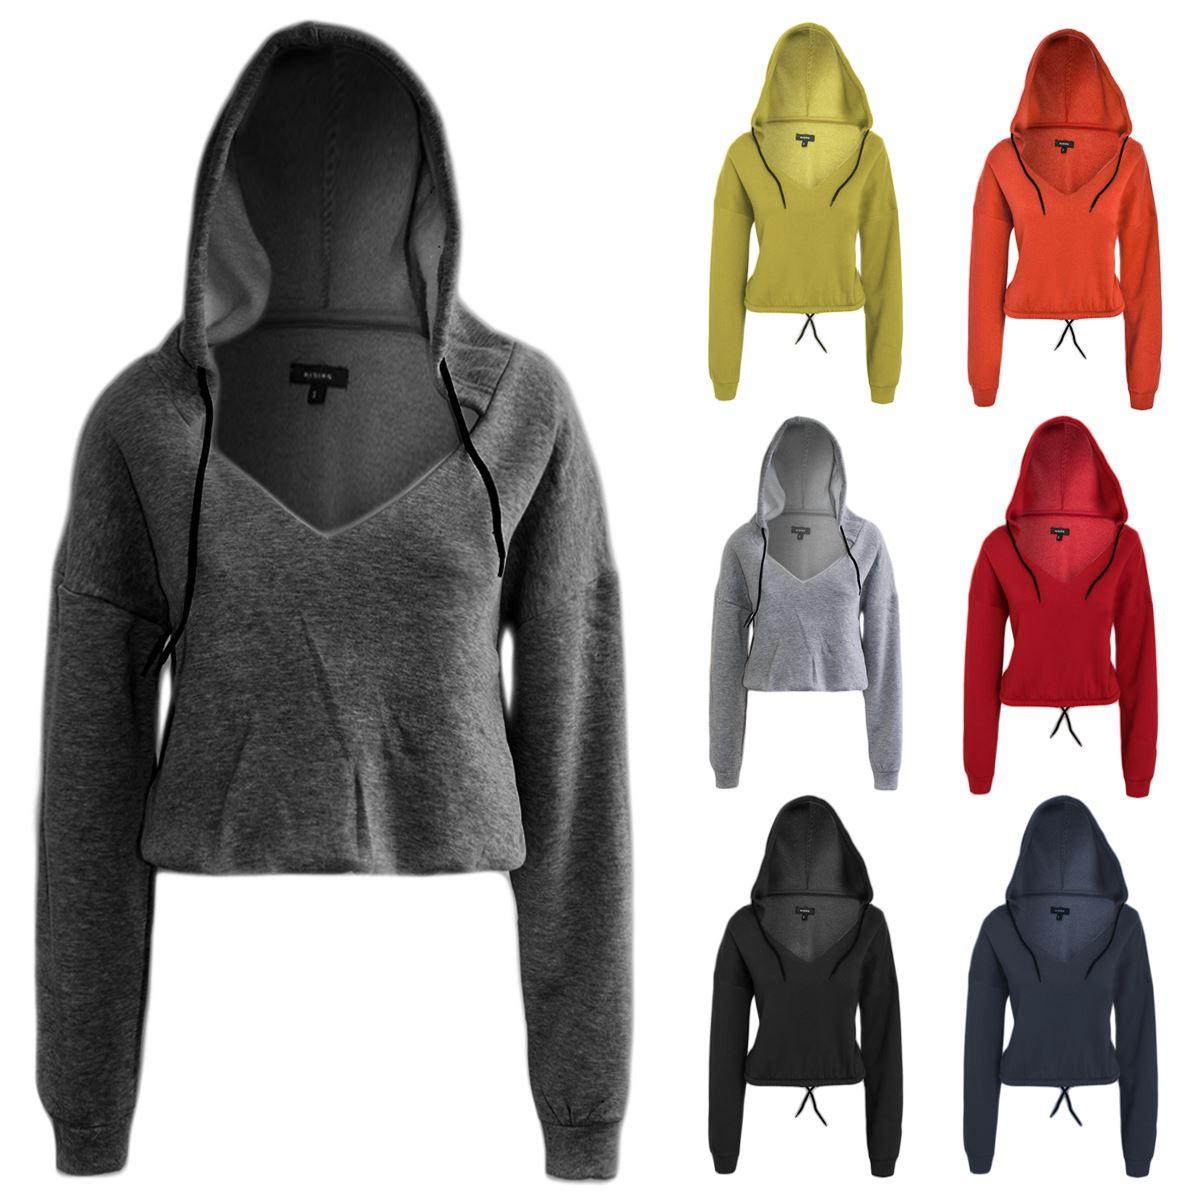 2aa971dcbb1 Details about Womens Fleece Cropped Pullover Plain Hoodie Sweatshirt Crop  Top Hooded Sweater